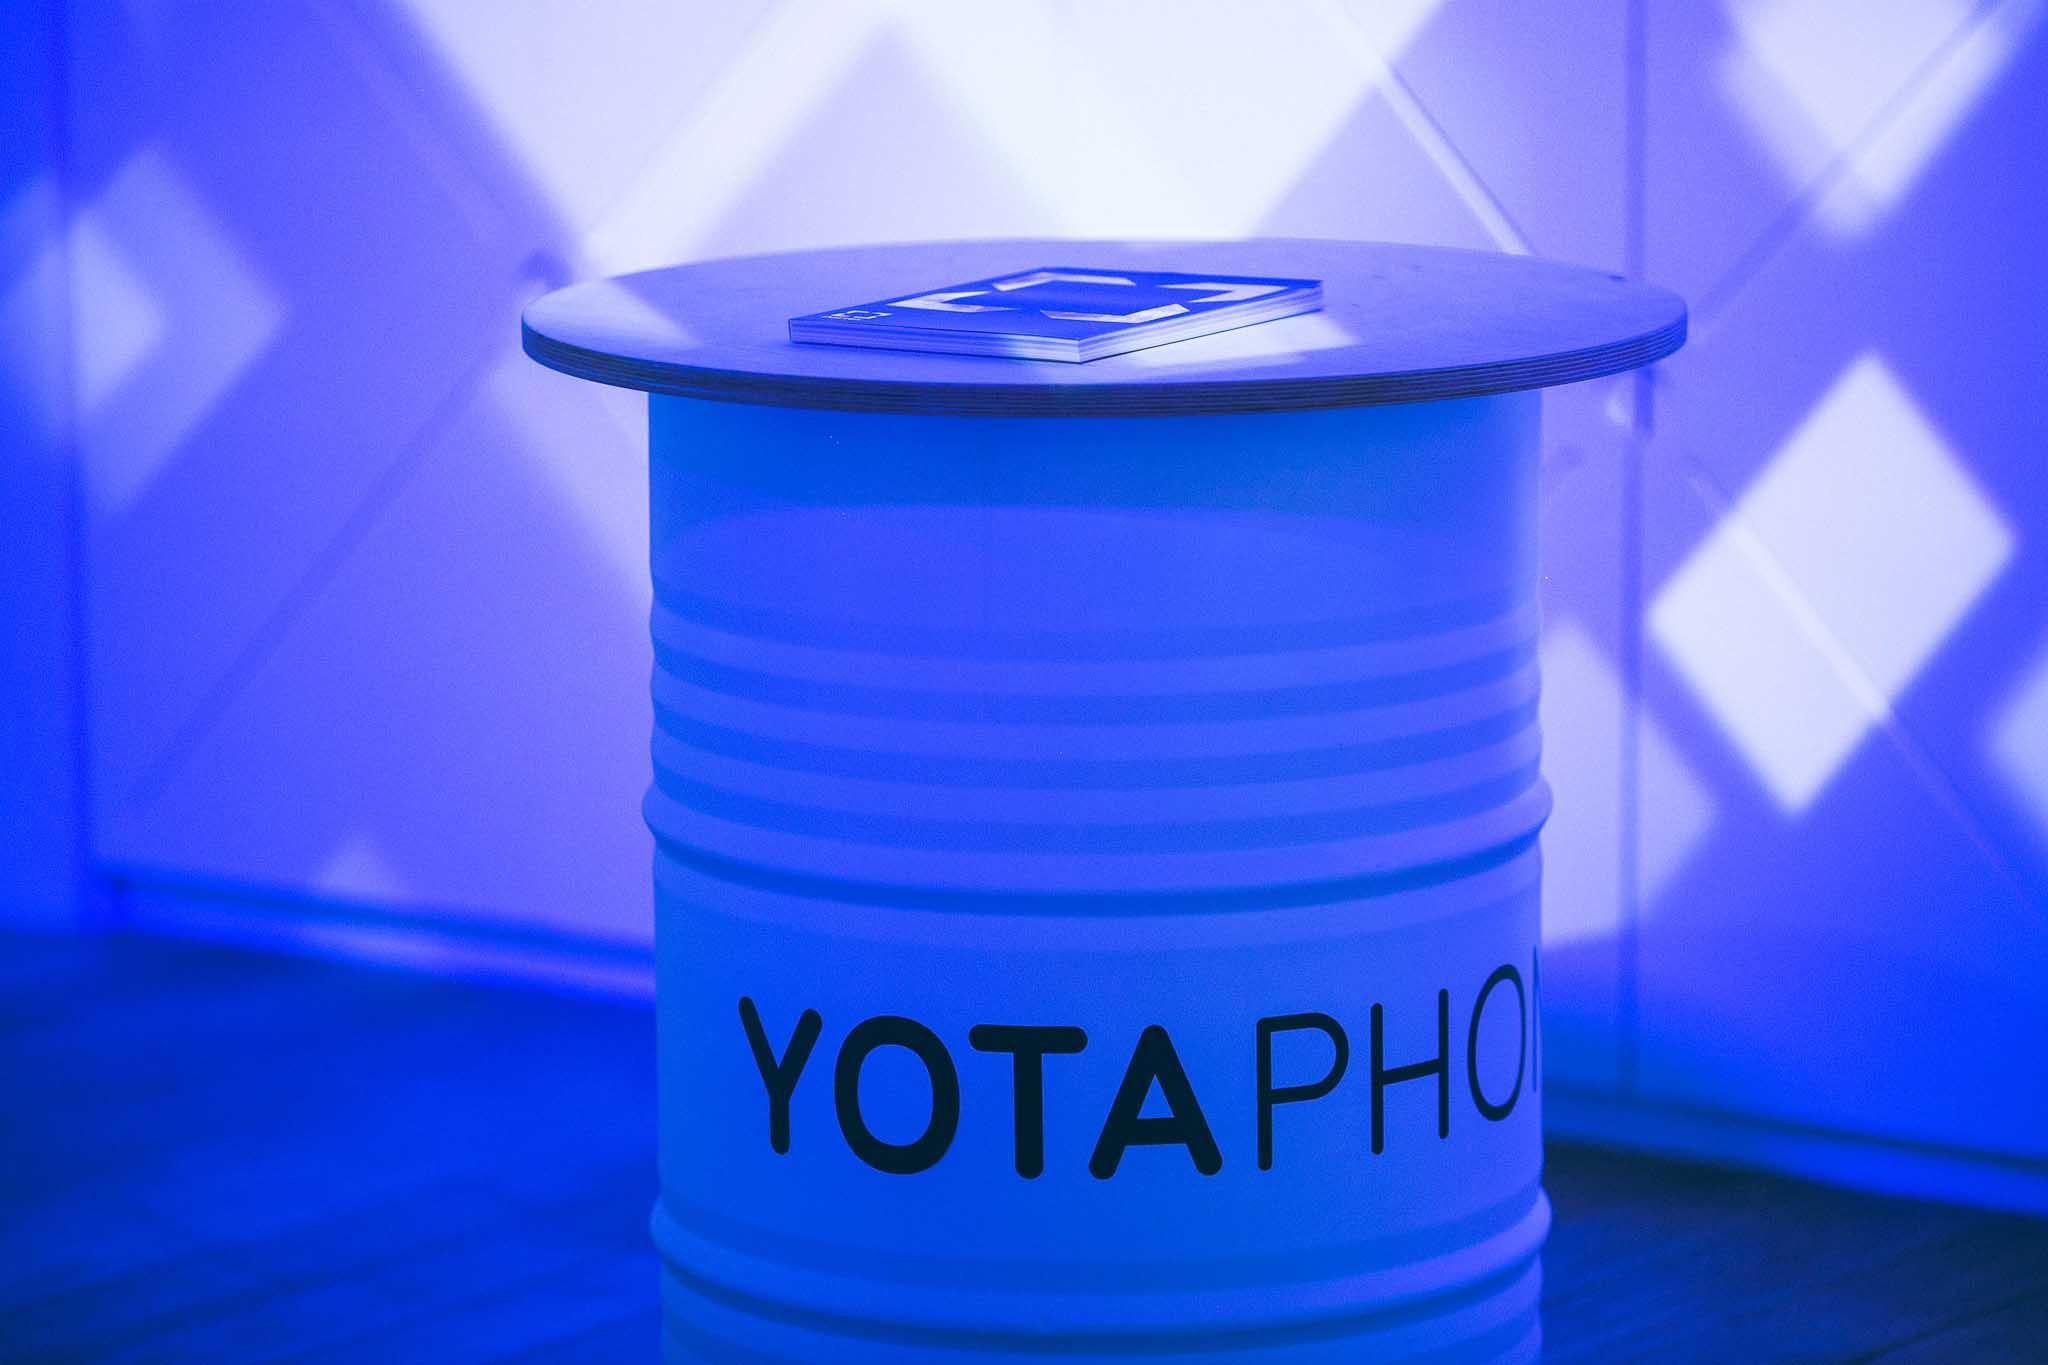 yp_20141202_155419_презентация_Event_yota_yotaphone_Urban_moscow